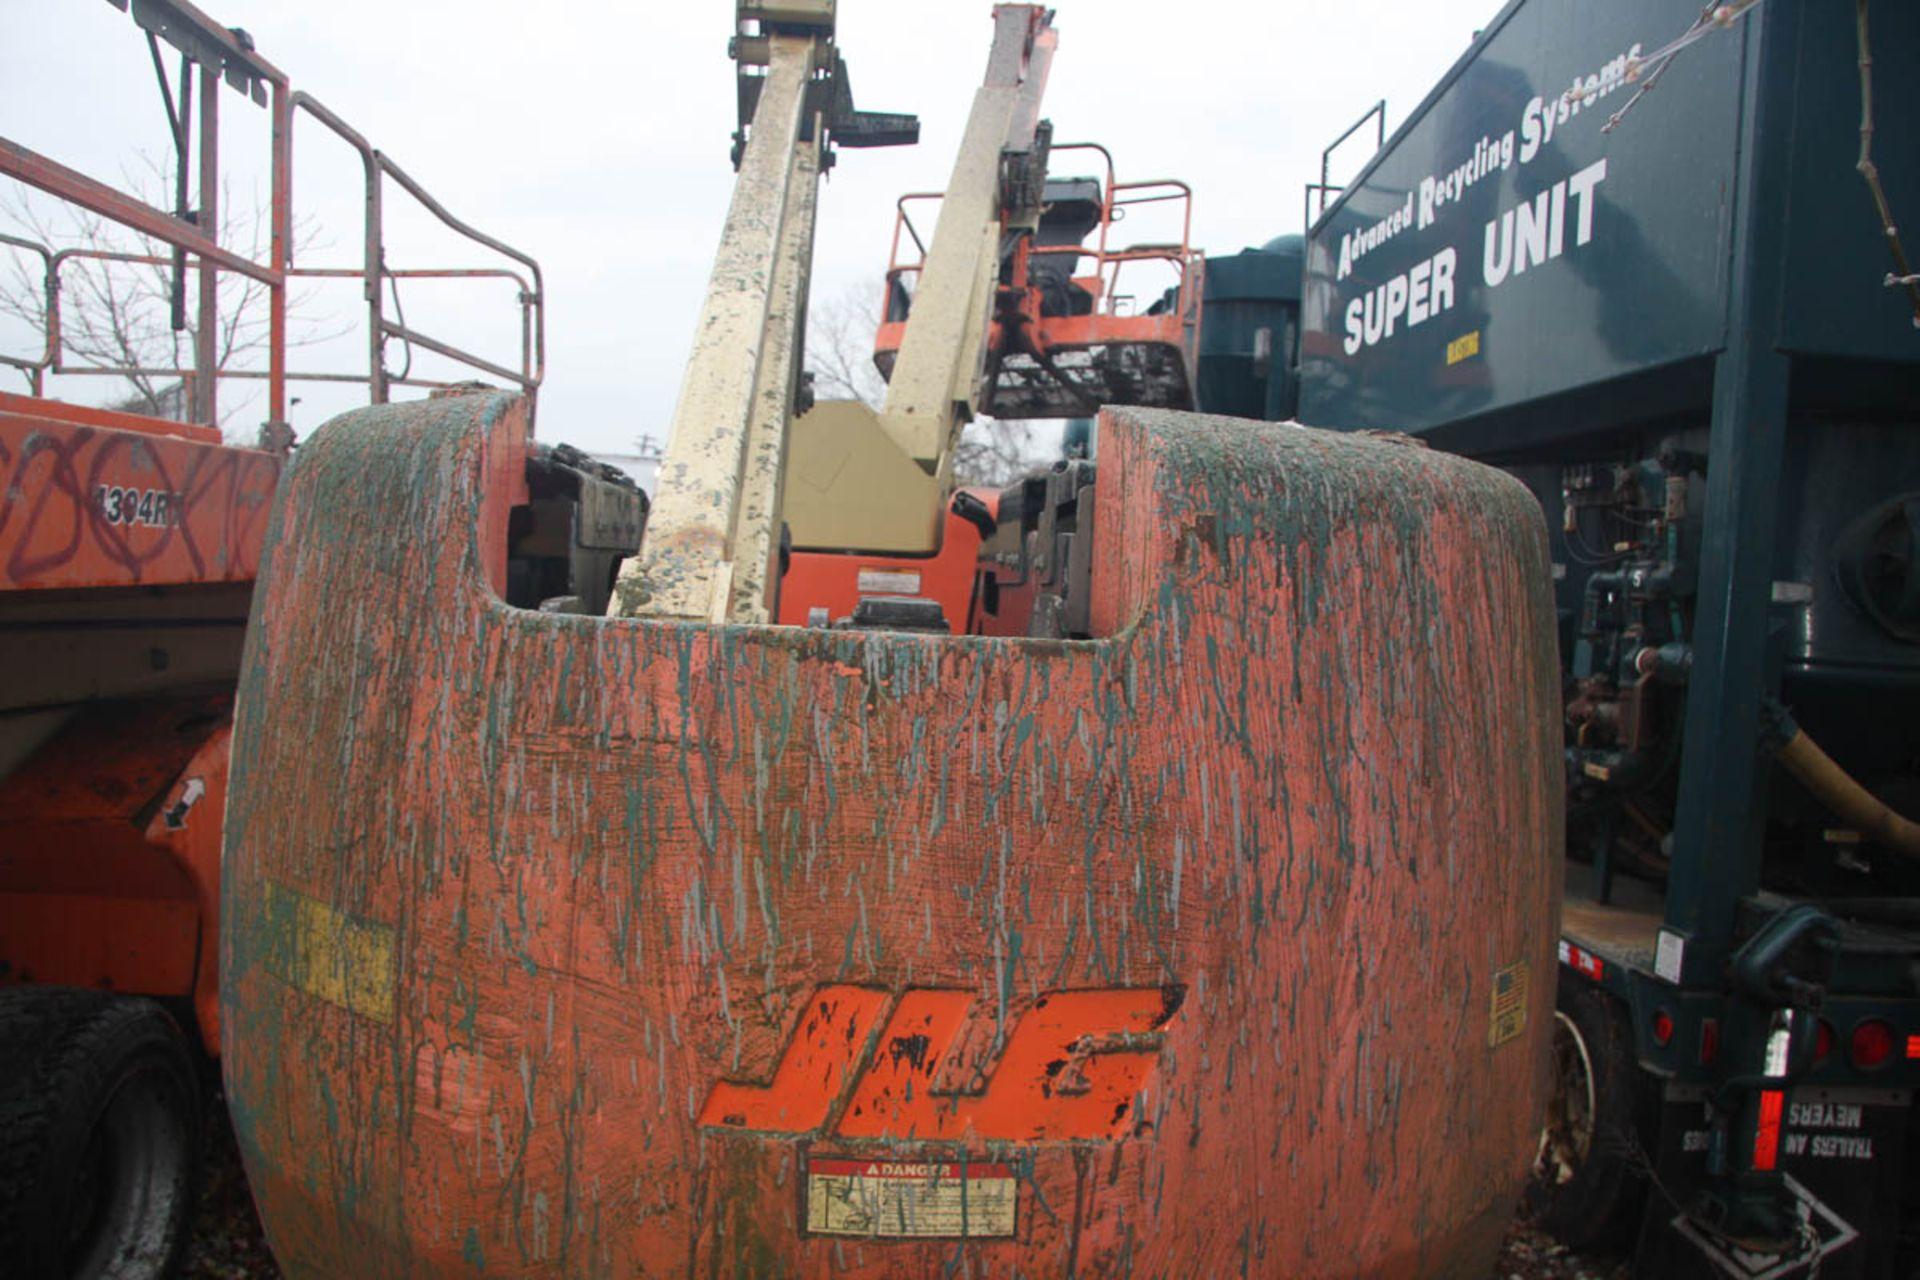 2002 JLG 450AJ SEIRES II BOOM LIFT, DIESEL, WITH 45' MAX HEIGHT, 500# CAPACITY, 24' HORIZONTAL - Image 6 of 9